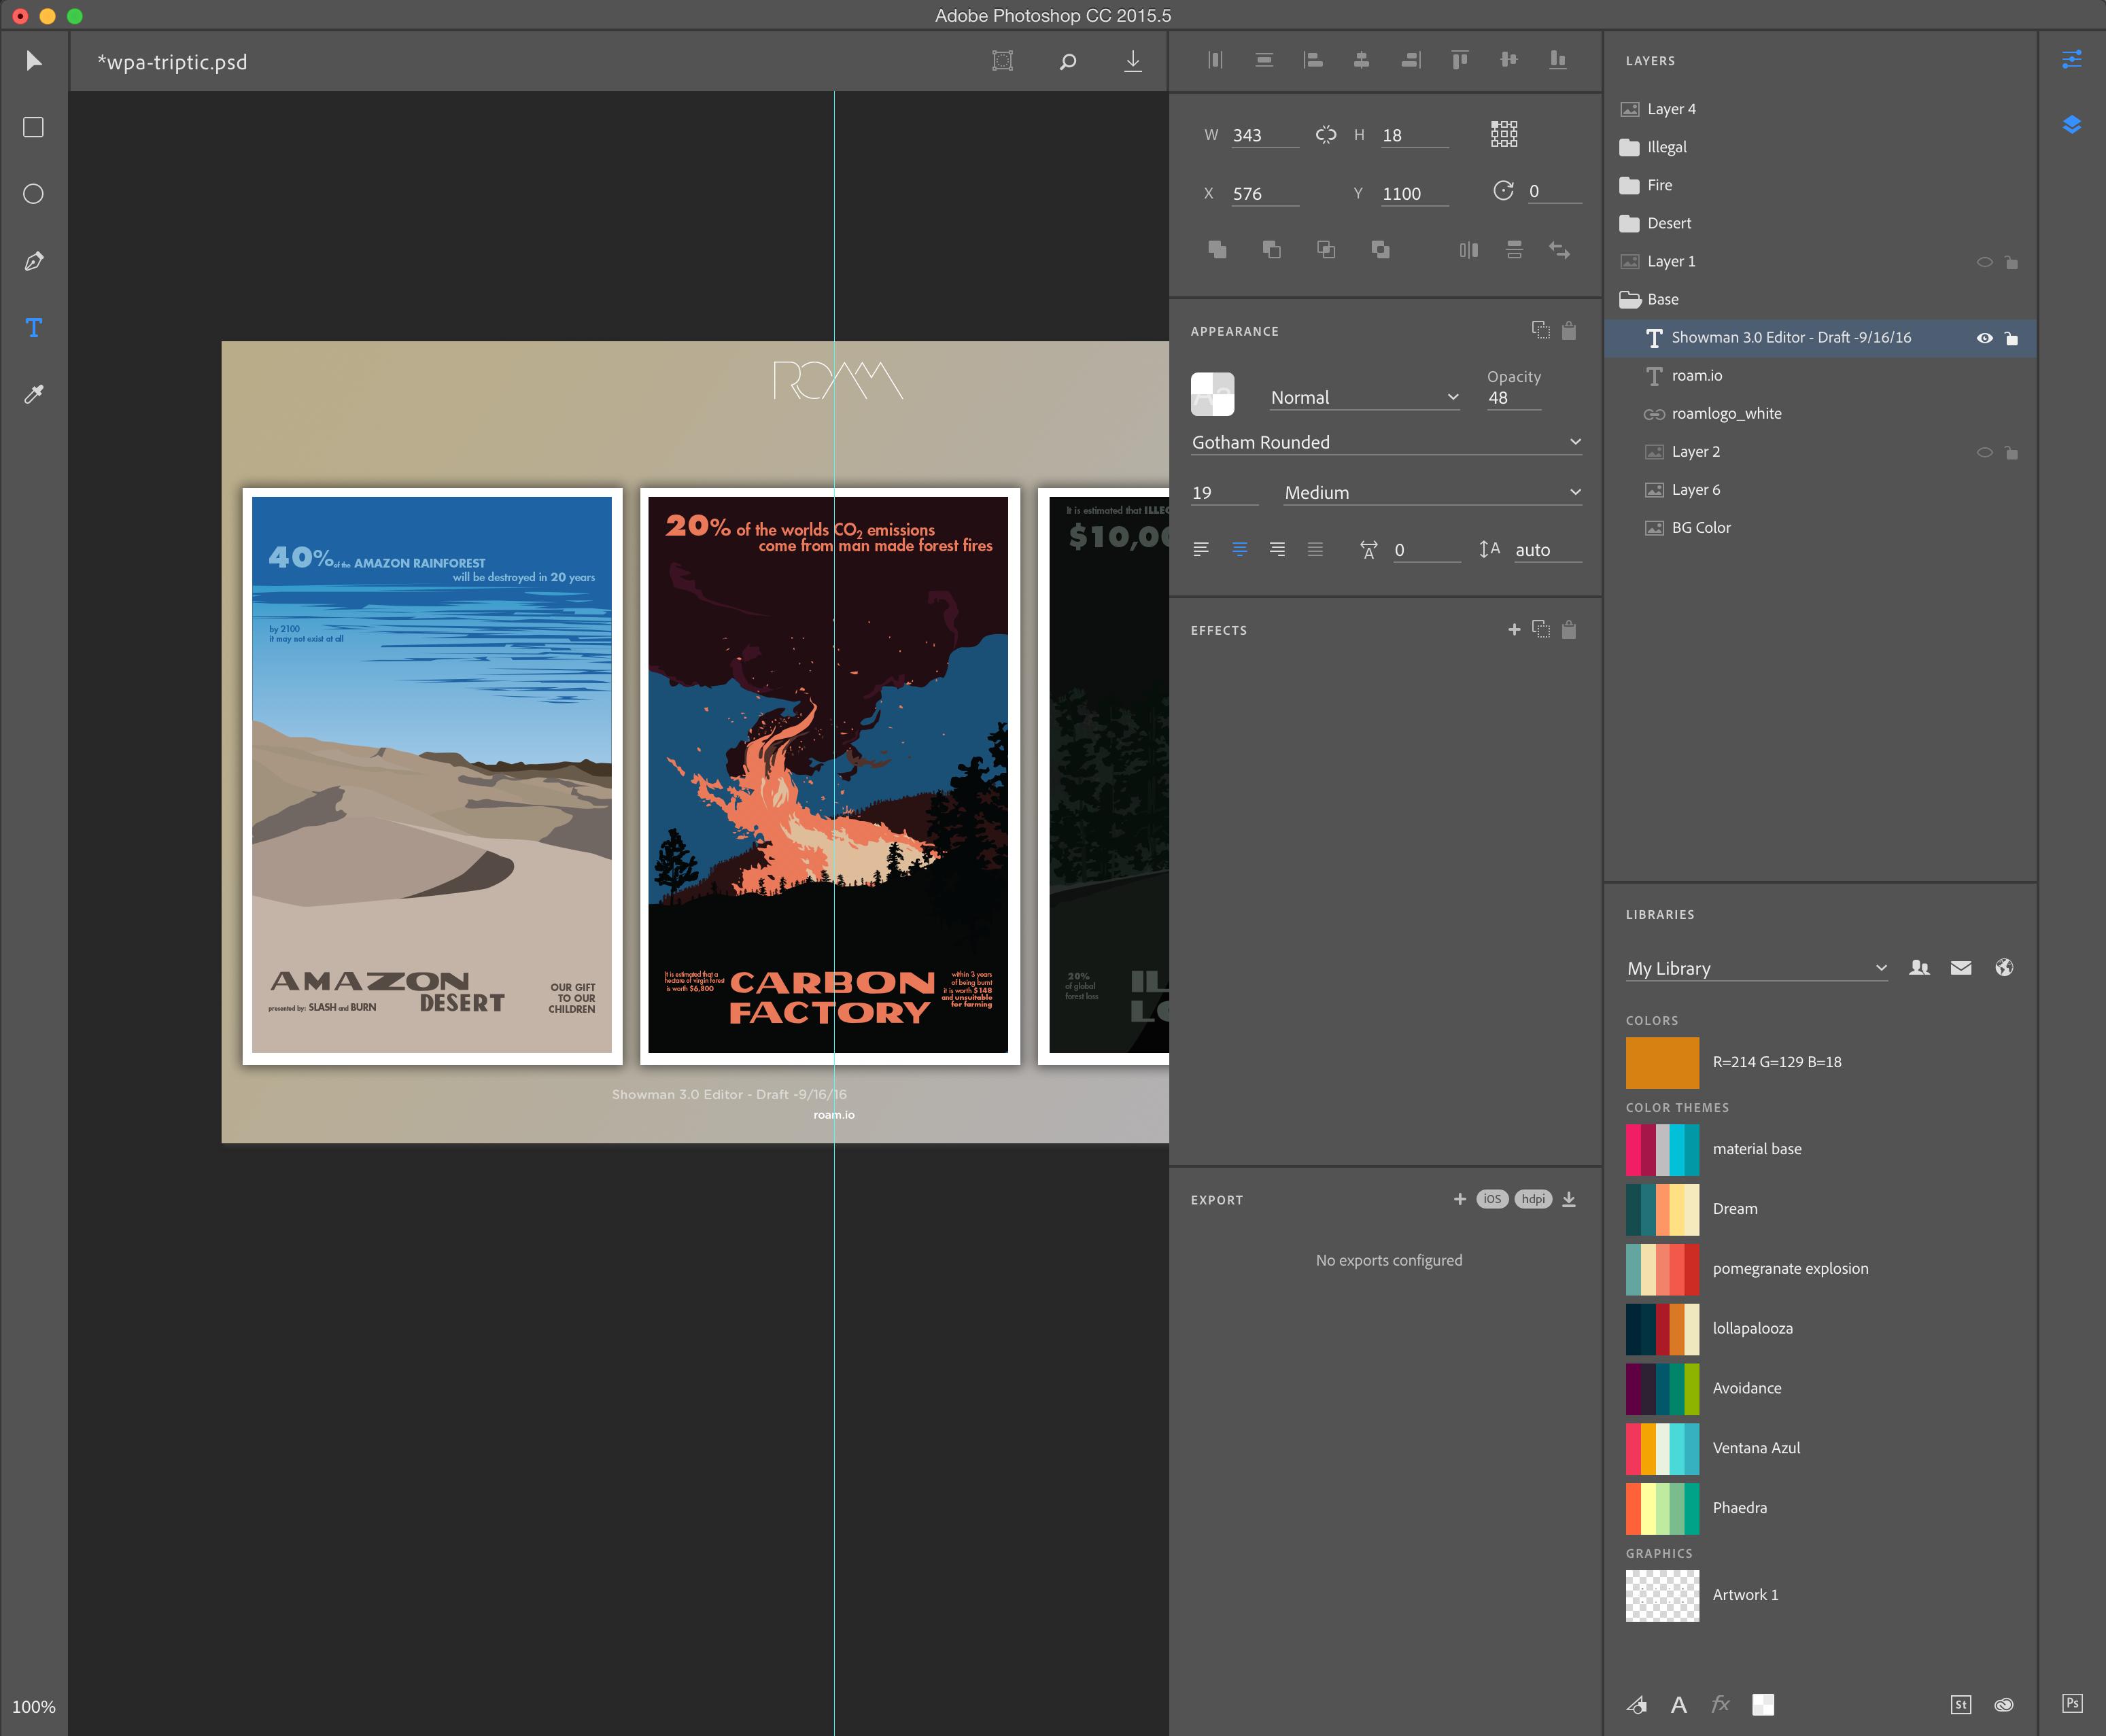 Photoshop's new editor mode